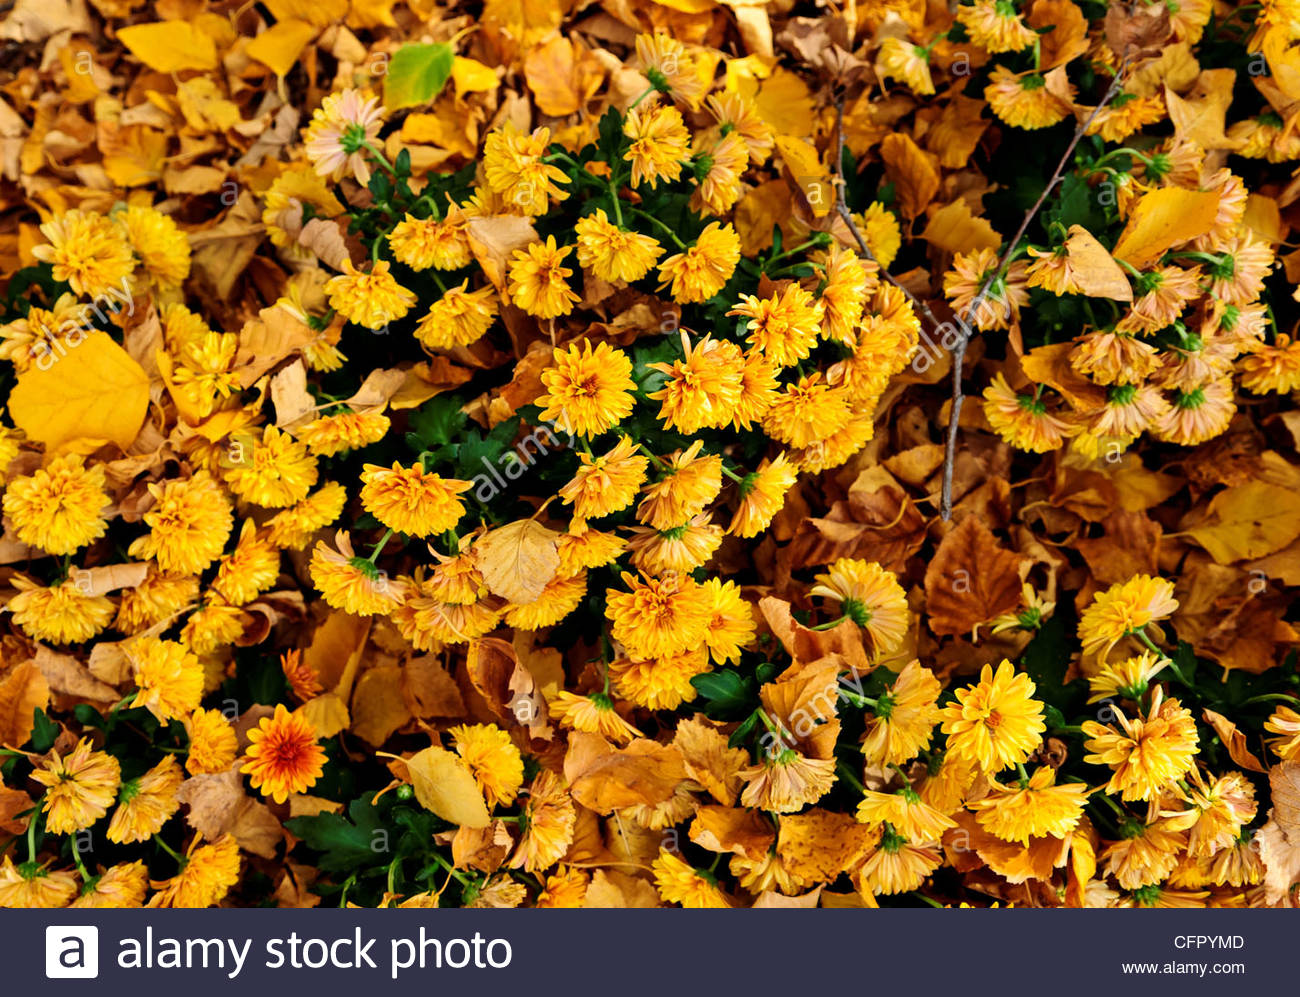 Yellow Chrysanthemums, Botanica, Wichita, Kansas, Sunday Oct 30, 2011 - Stock Image